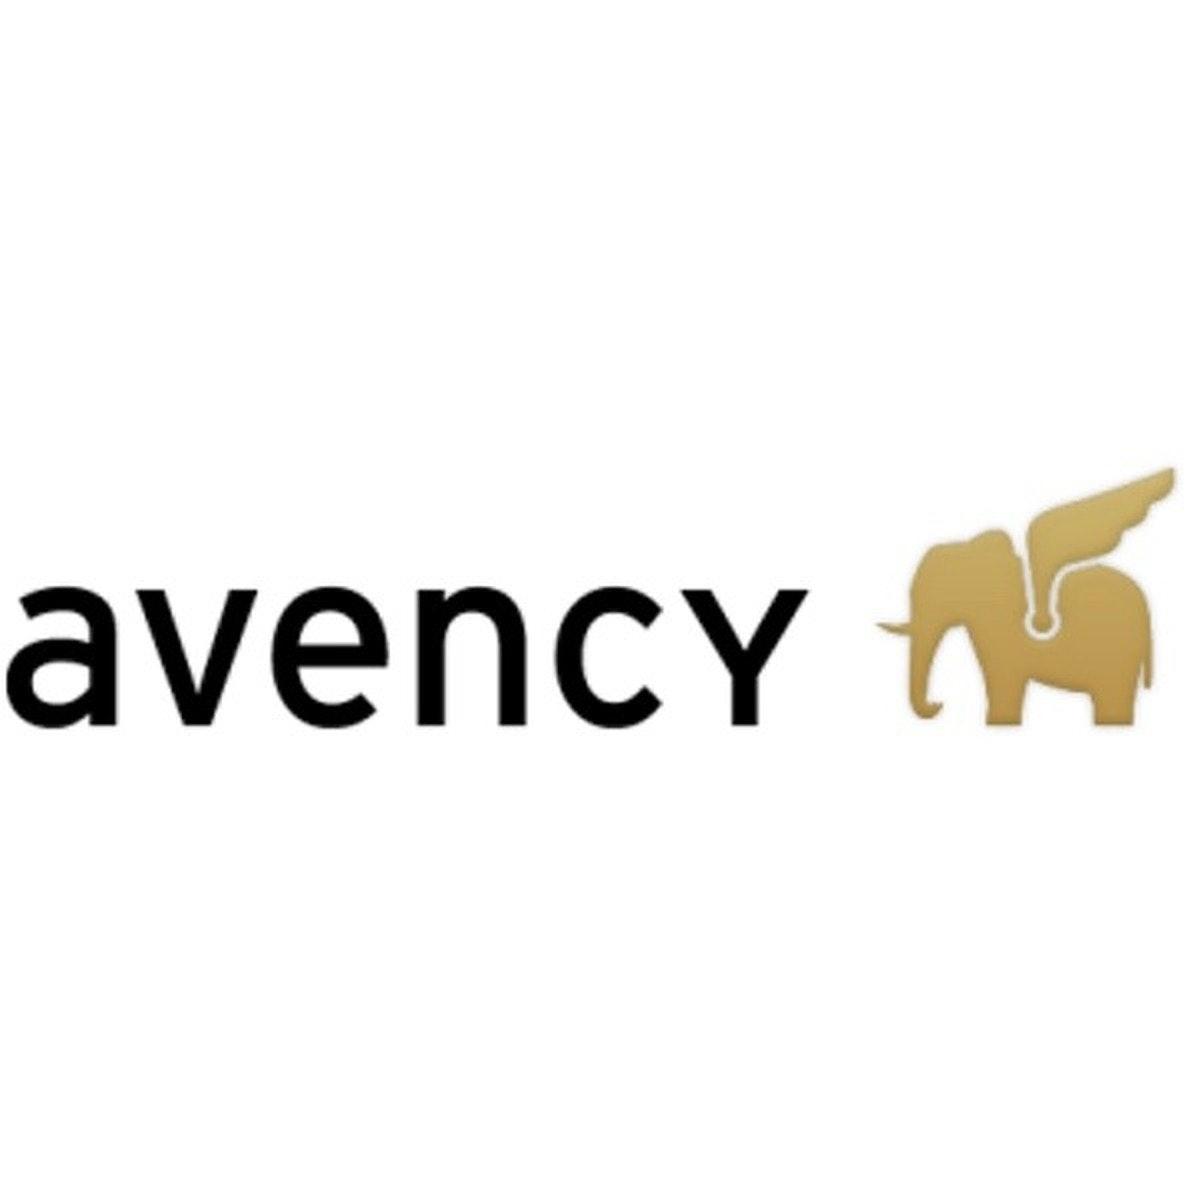 avency GmbH